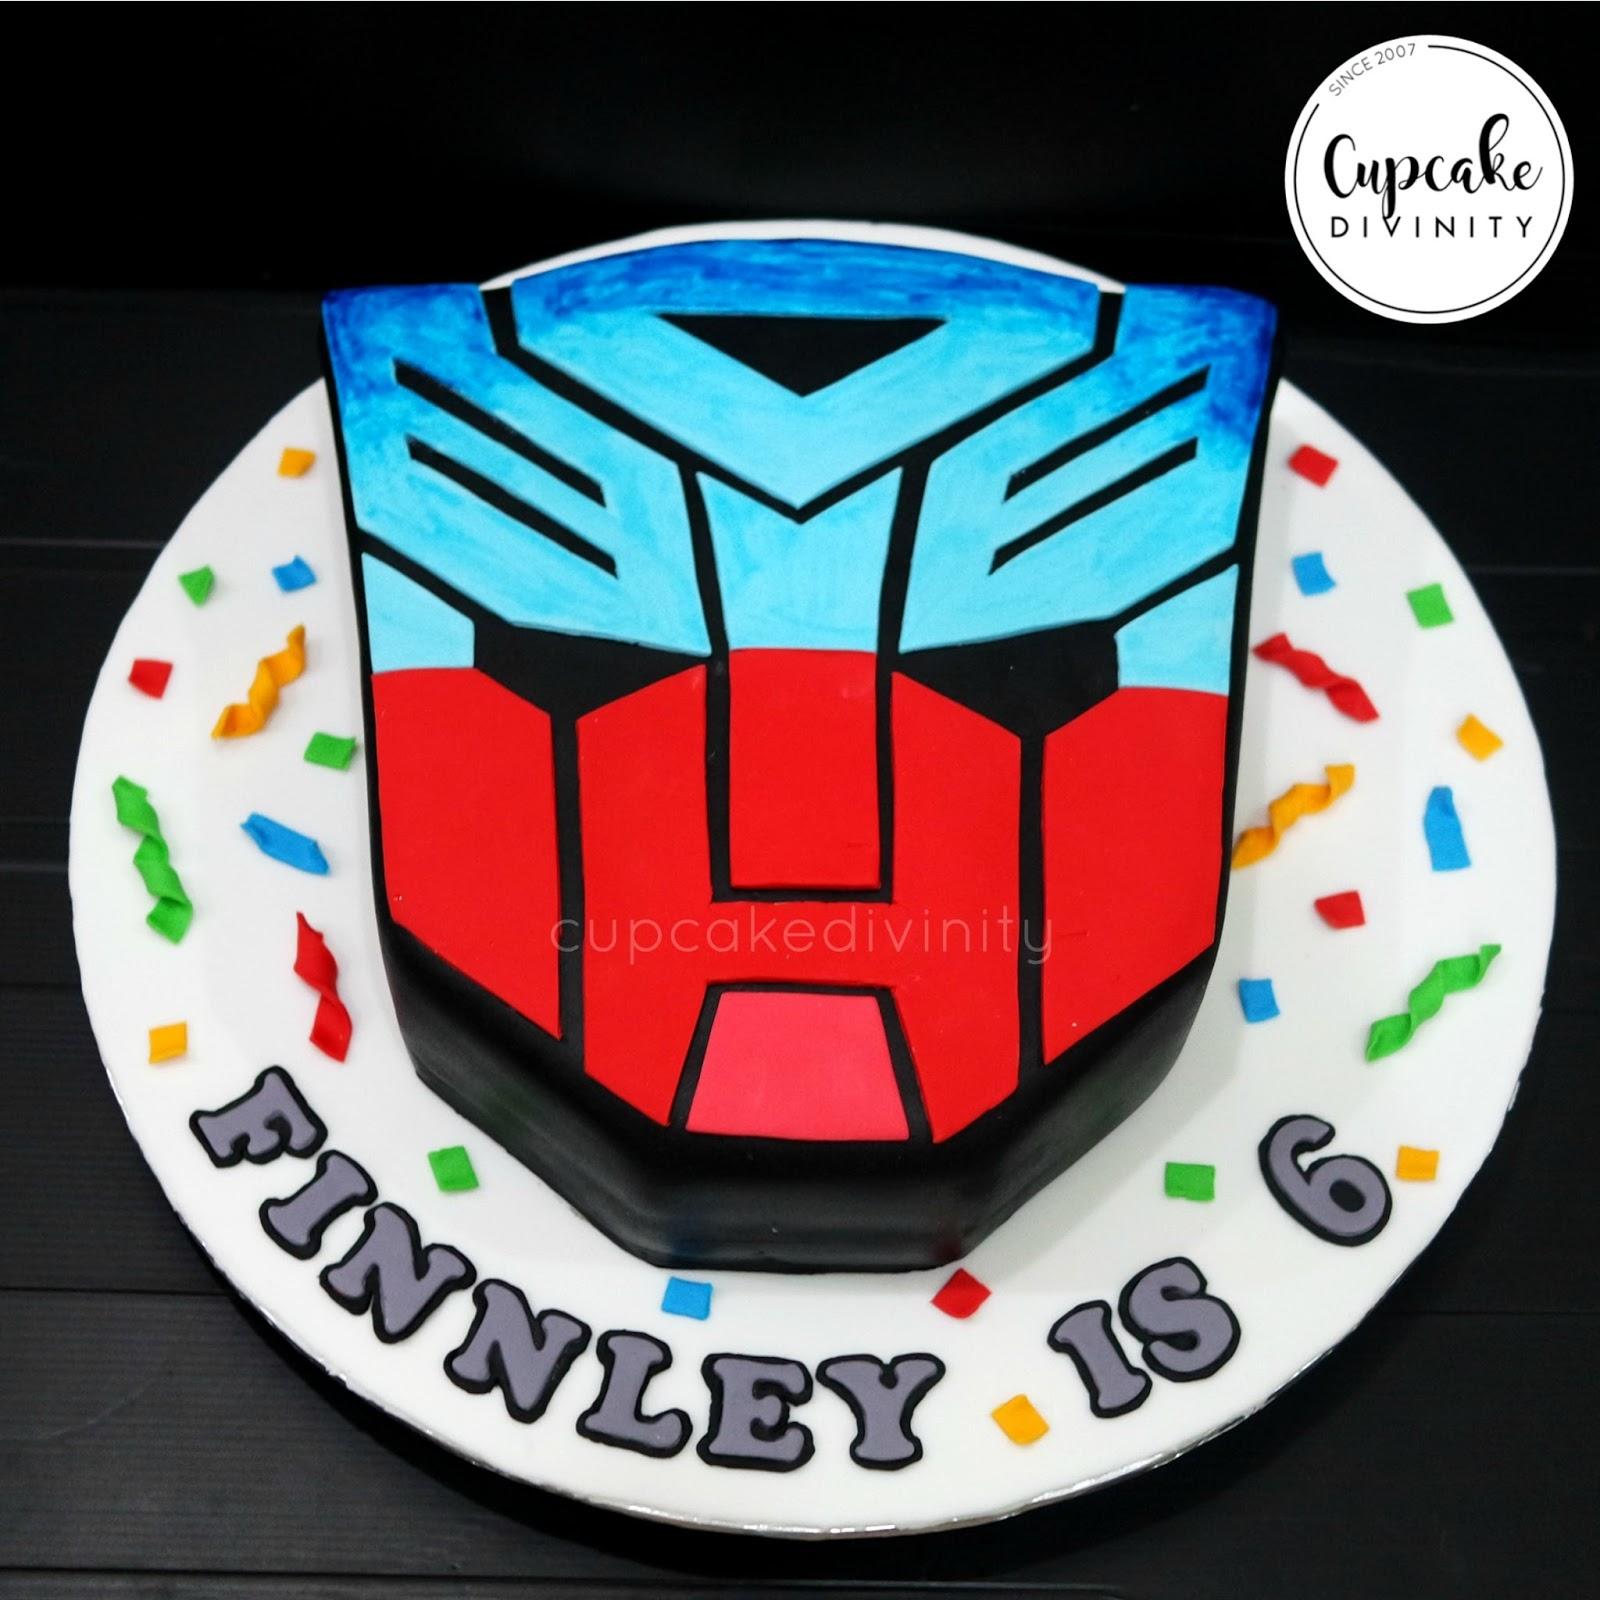 Cupcake Divinity Transformers Logo Cake